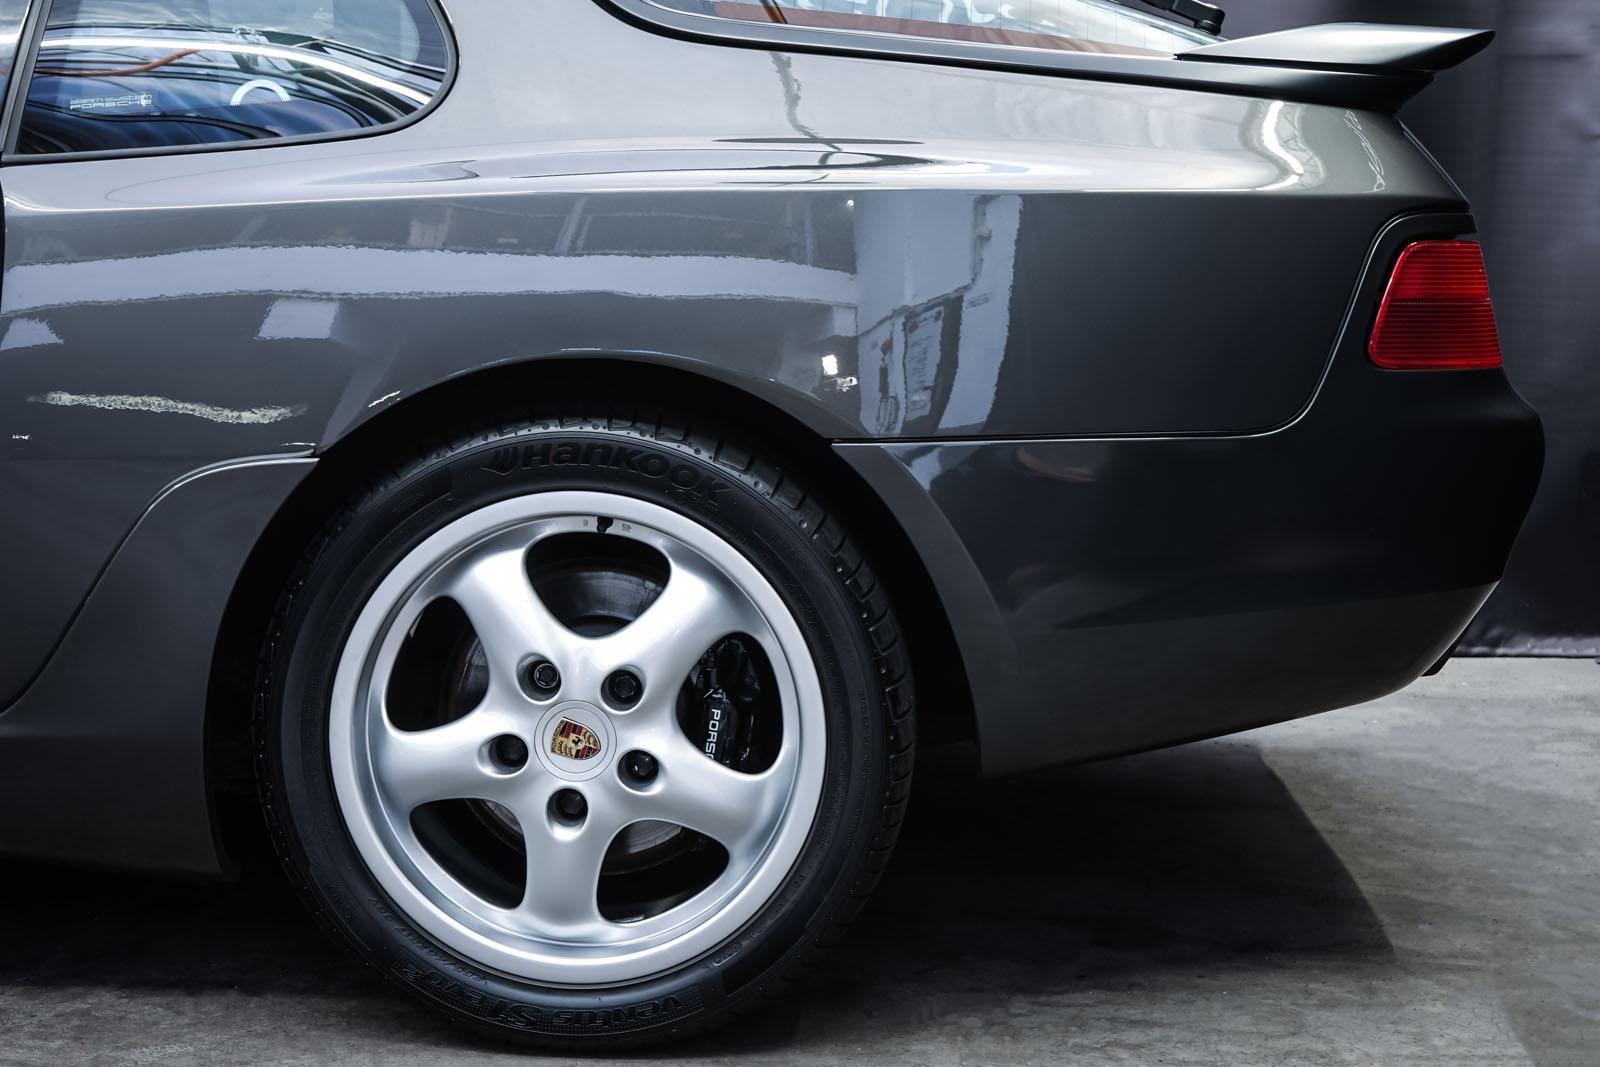 Porsche_986_Targa_Grau_Pink_POR-1092_4_w